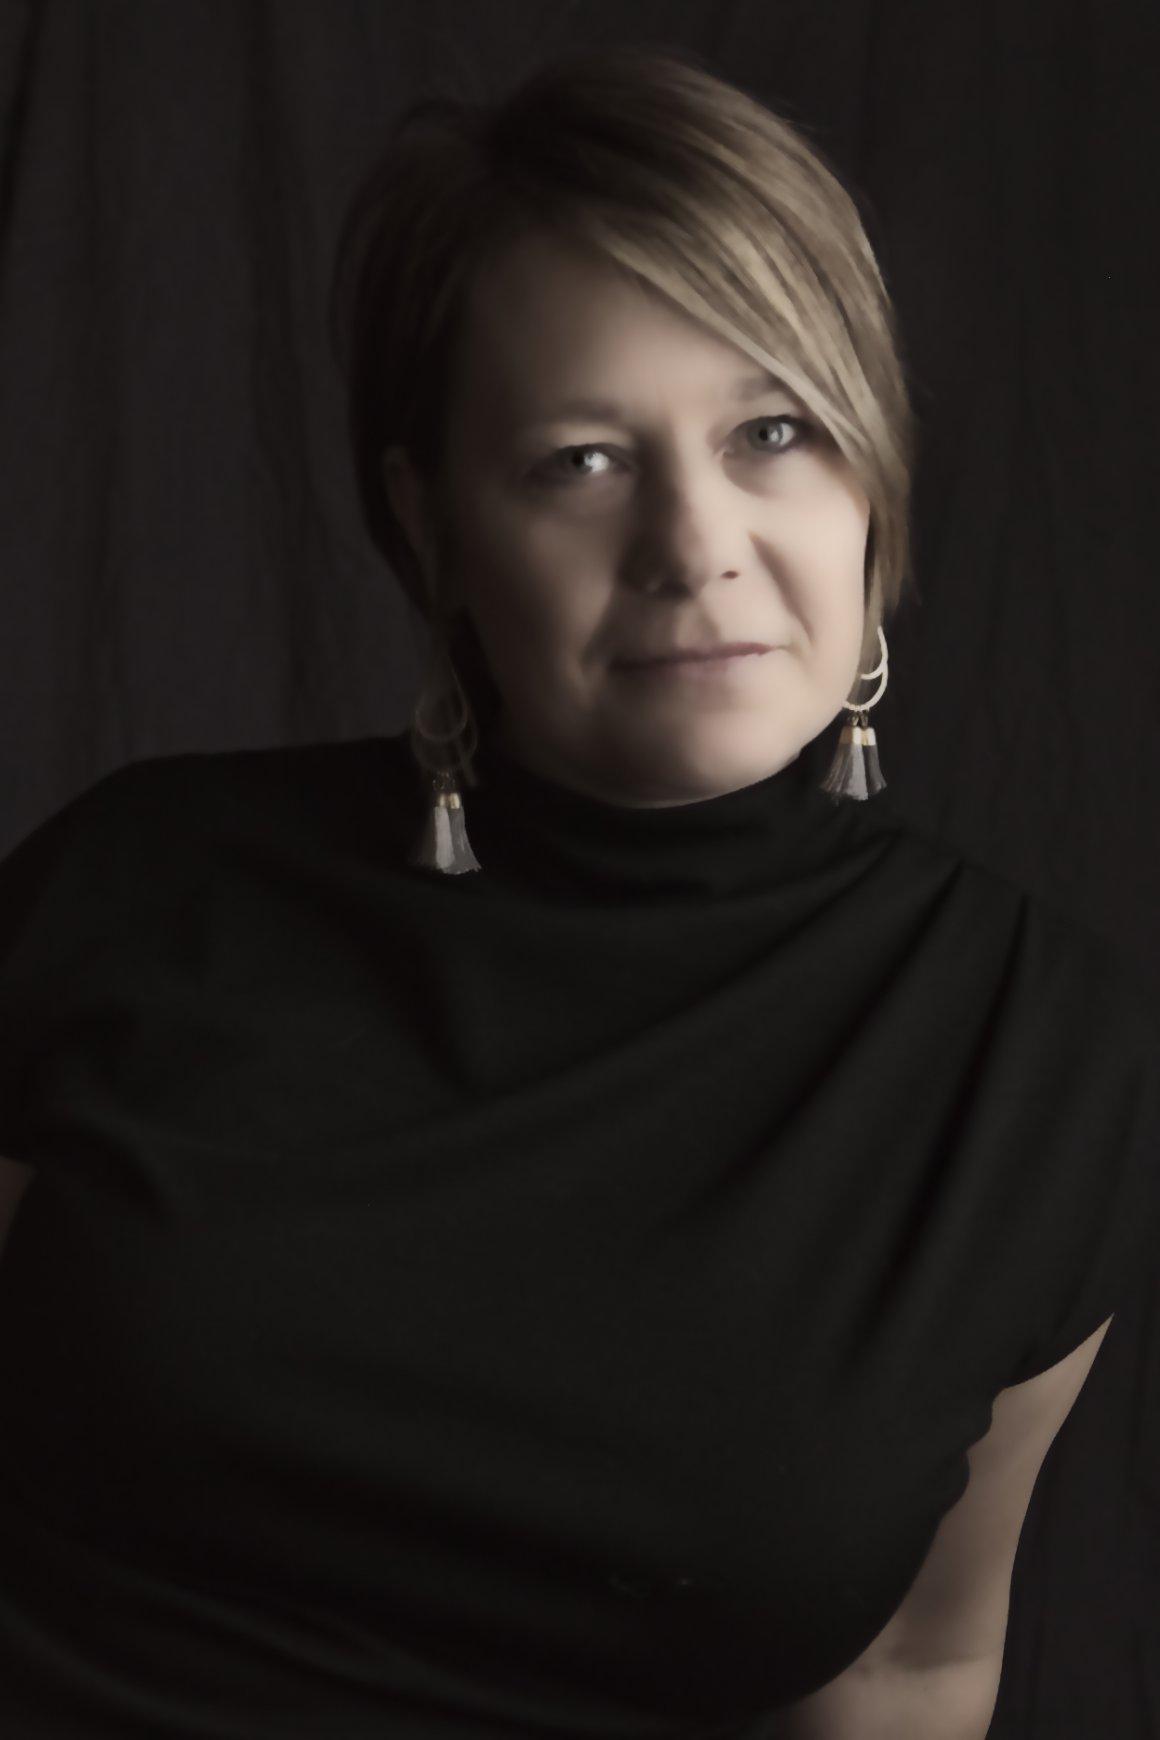 Diane Hochhalter - Diane Hochhalter Photographer & Costume Designer